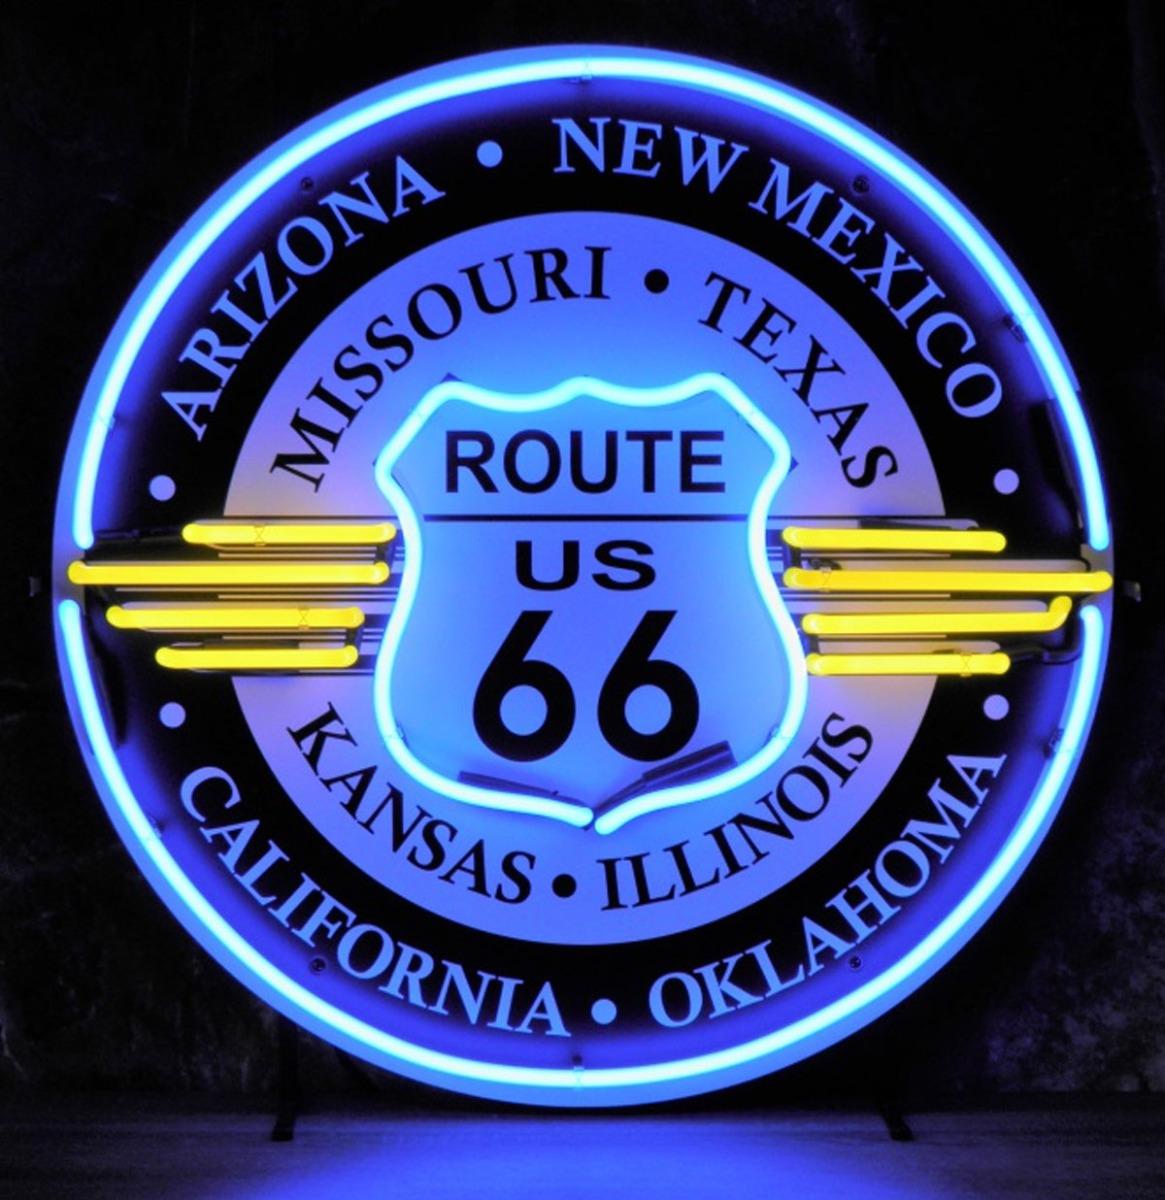 Route 66 All States Neon Verlichting Met Achterplaat 65 x 65 cm